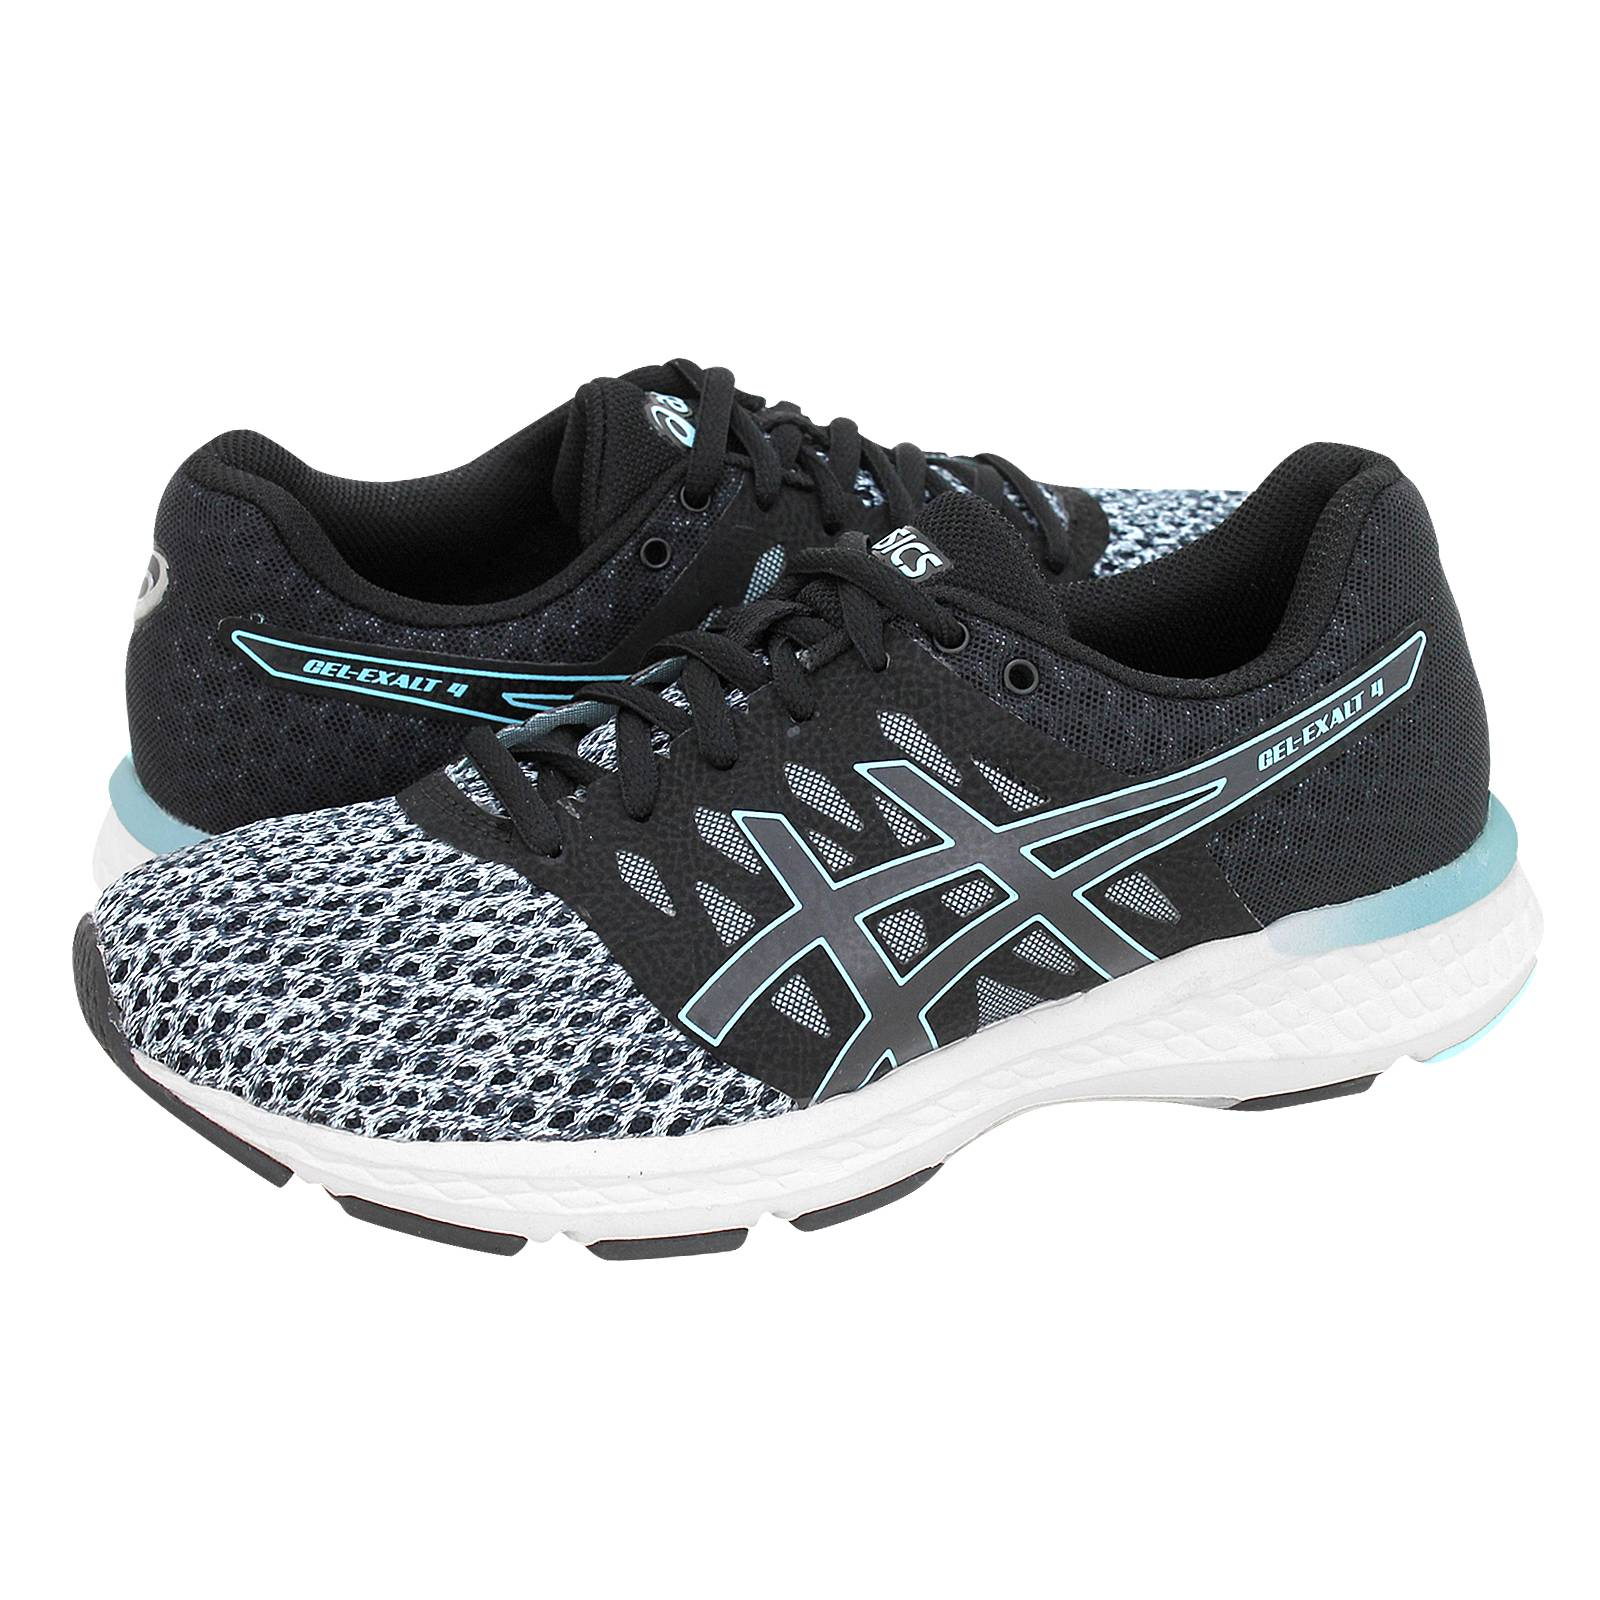 5dd0e2c6e31 Gel-Exalt 4 - Γυναικεία αθλητικά παπούτσια Asics από υφασμα και ...